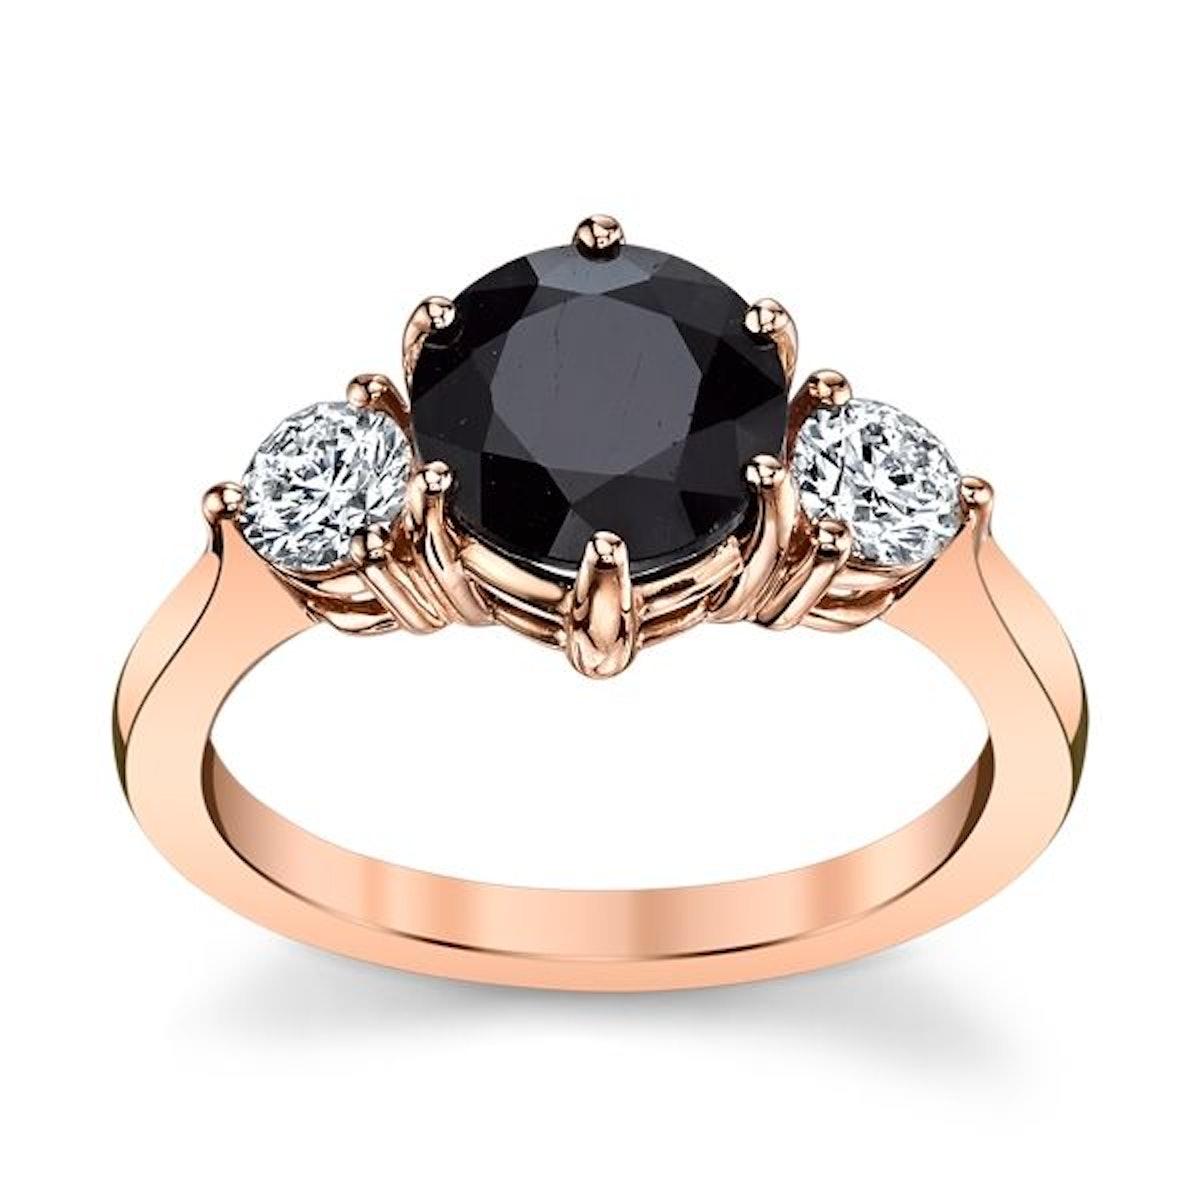 Blossom Bridal 14K Rose Gold Blue Sapphire Diamond Engagement Ring